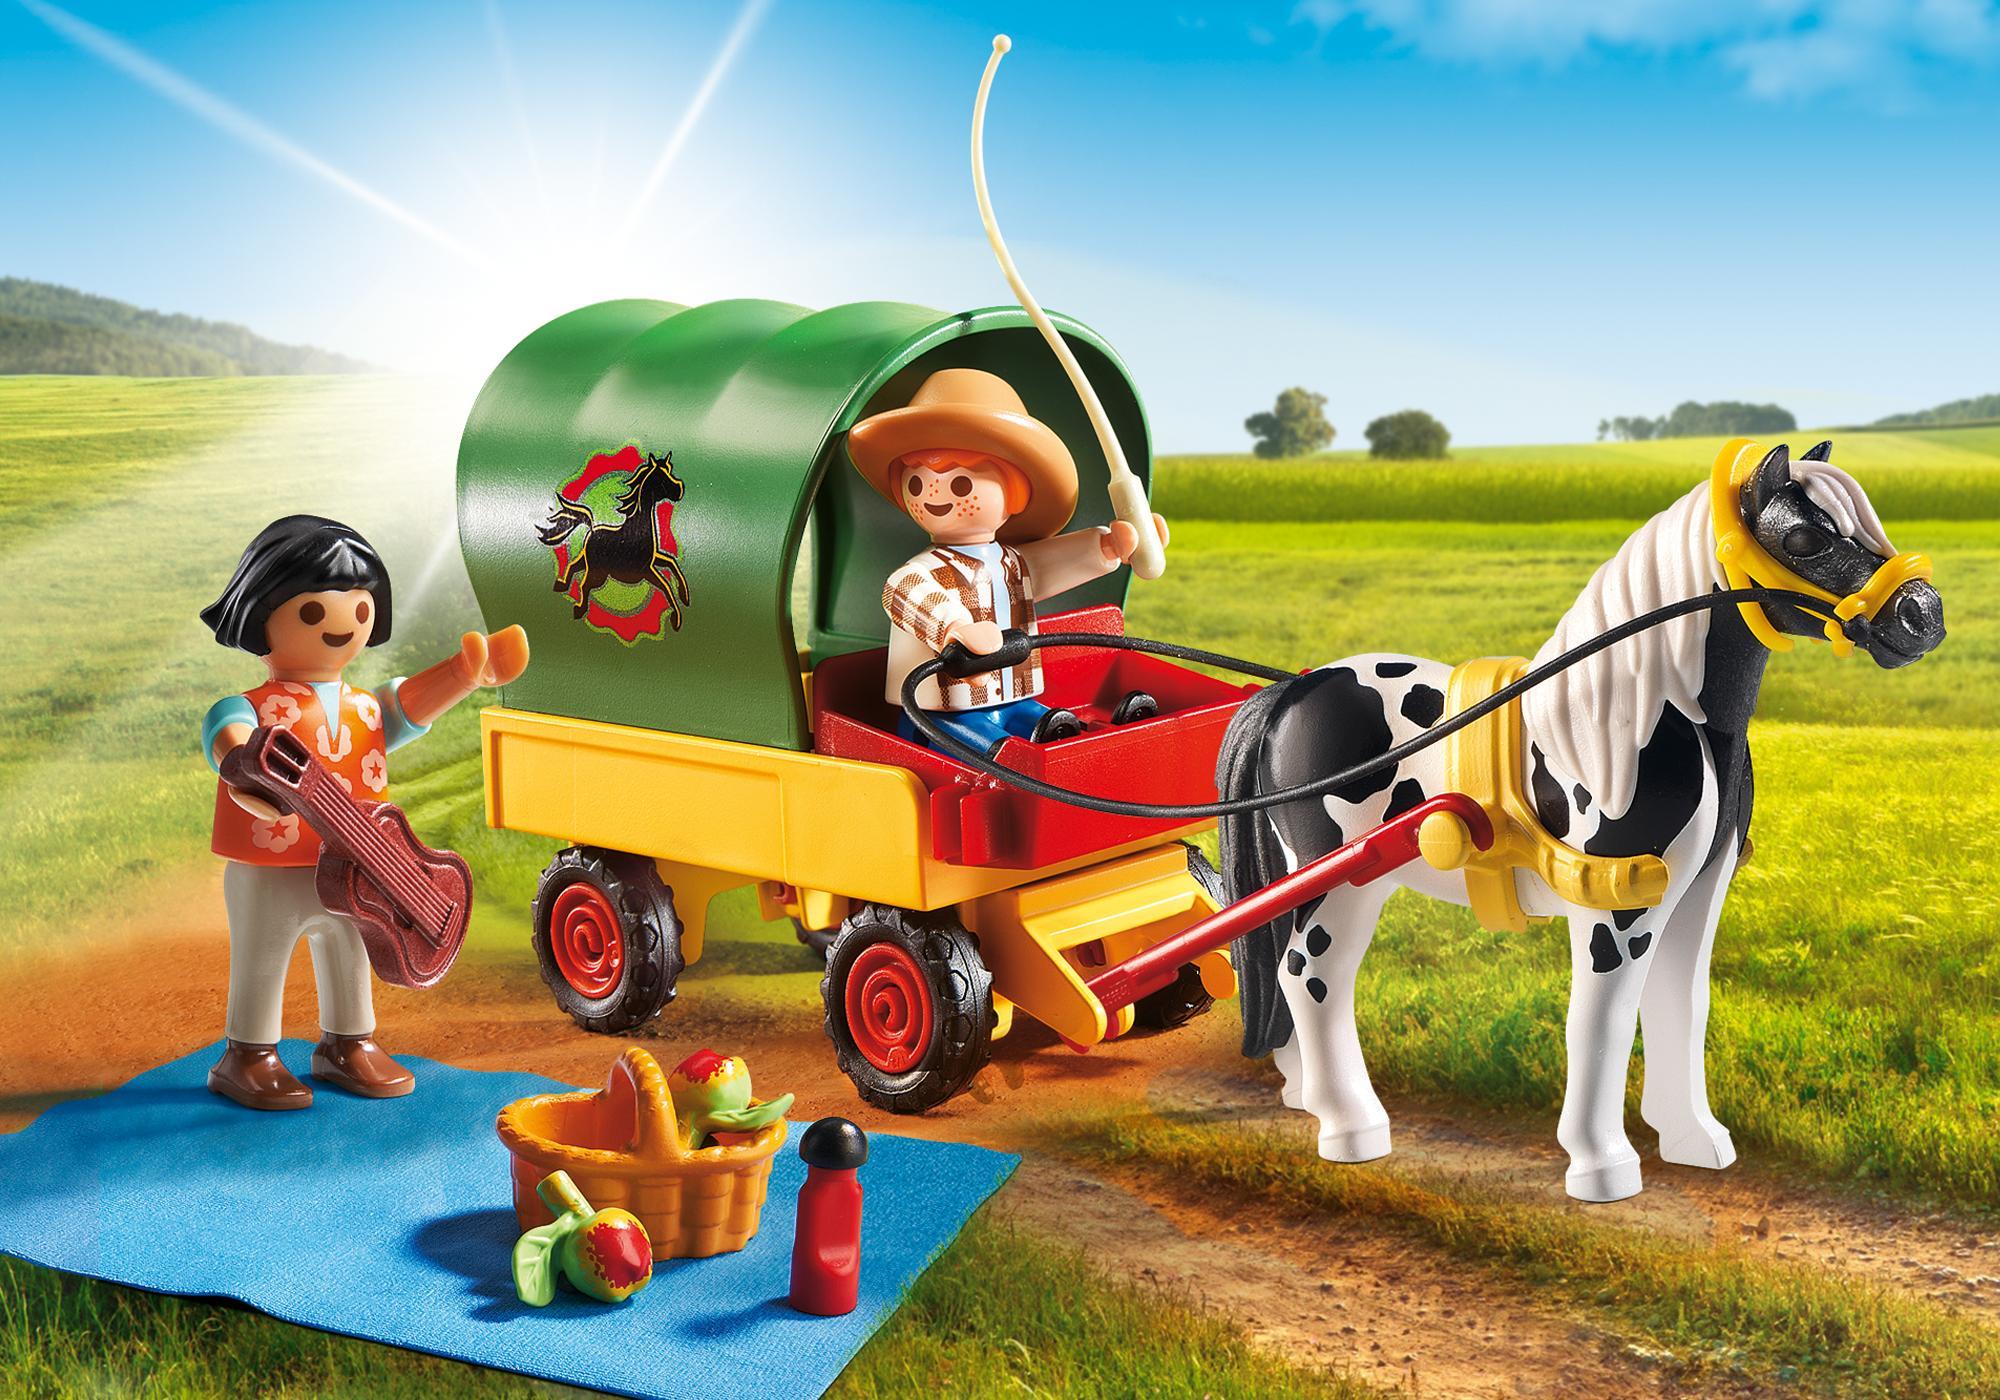 http://media.playmobil.com/i/playmobil/6948_product_detail/Picknick med ponnyvagn